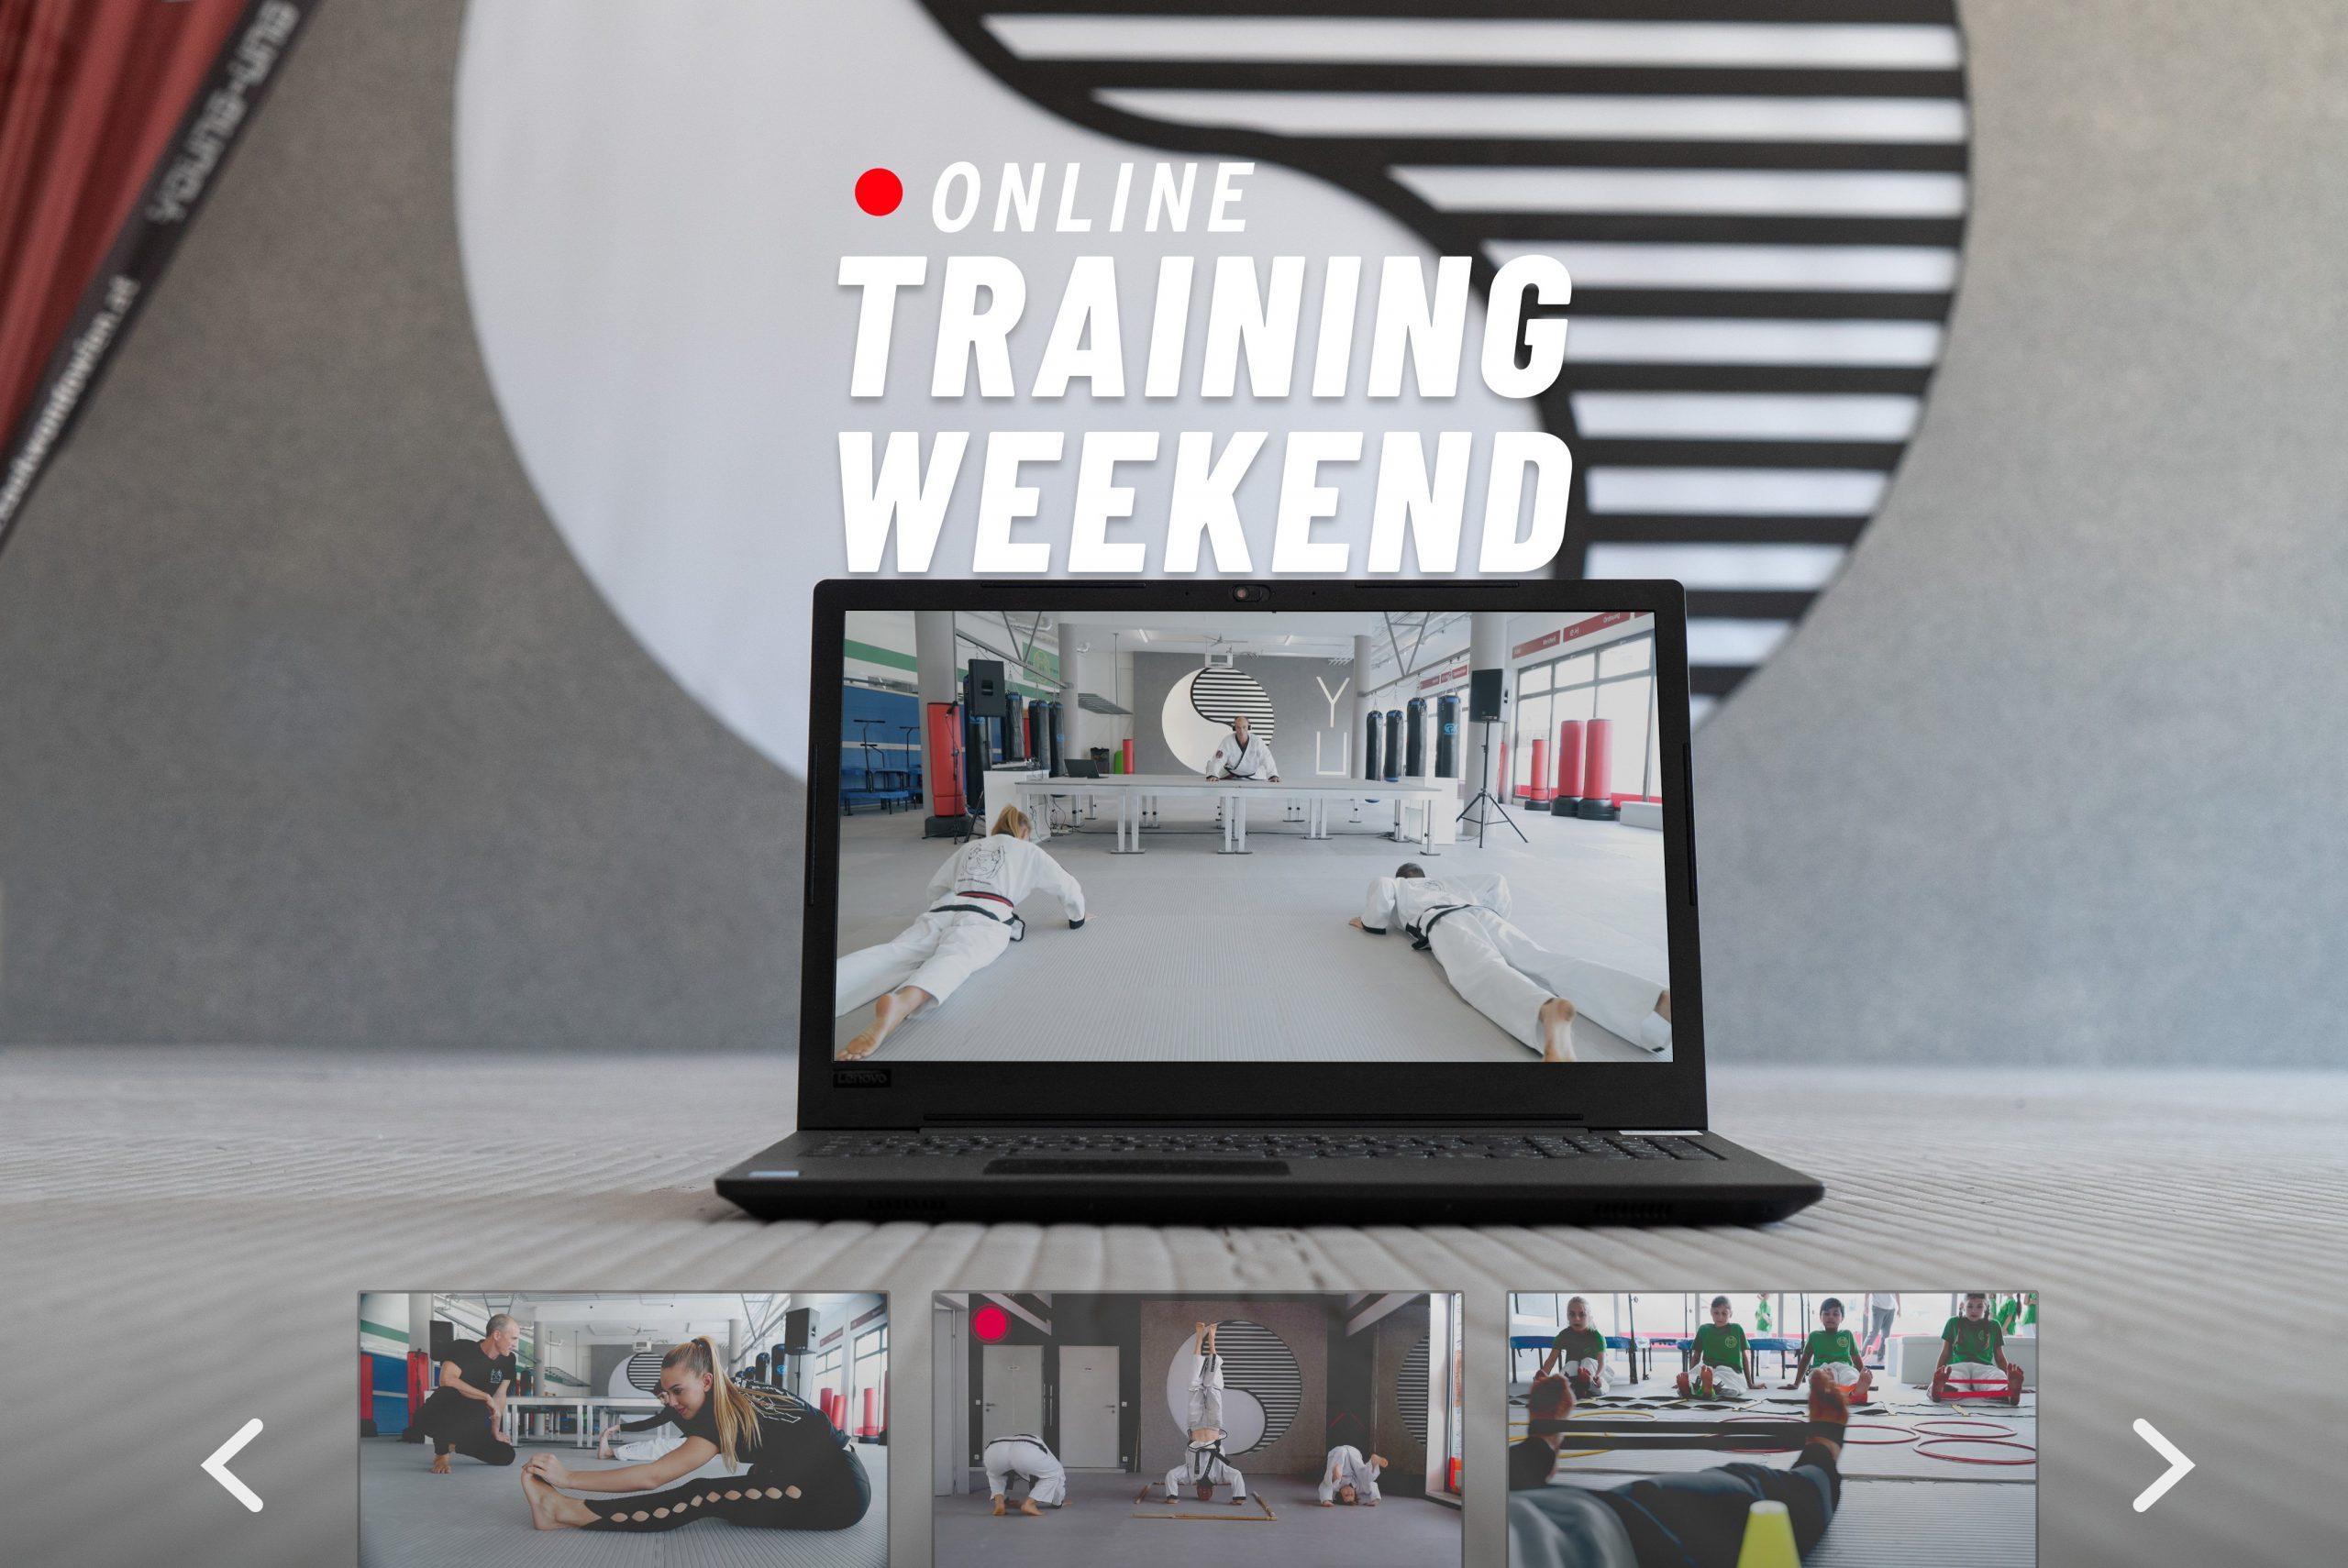 Online-Training Weekend am Laptop